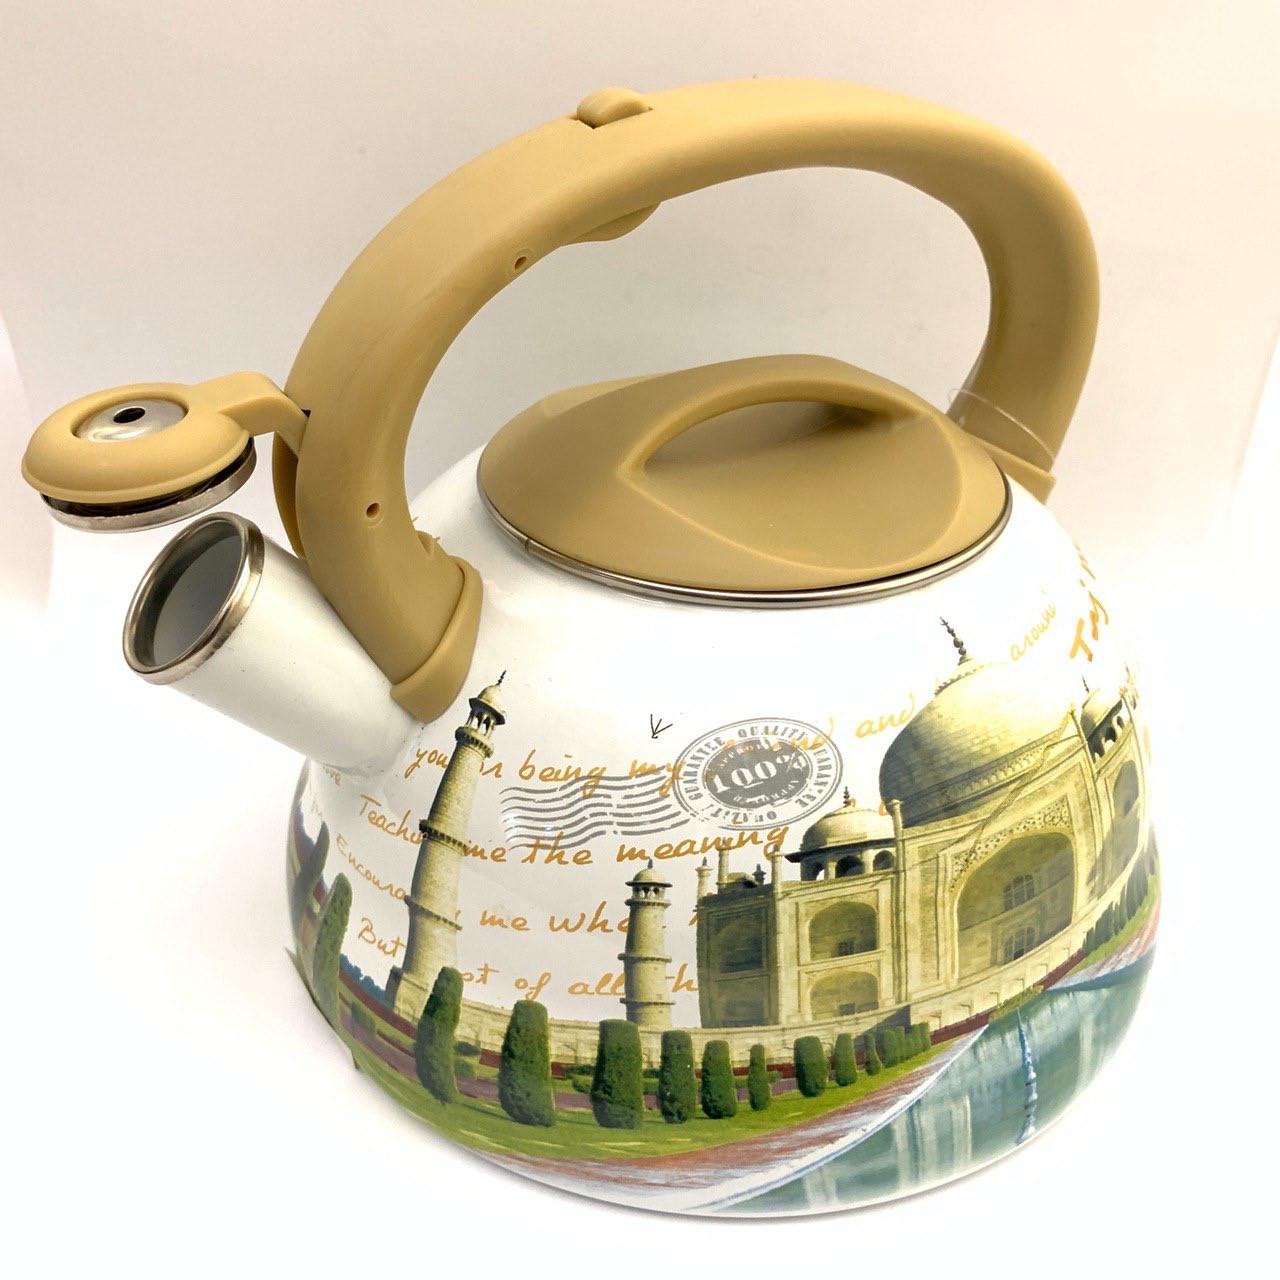 Чайник с свистком Hoffner 4932 Taj Mahal 3,3 литра, индукцуя, газ, электро, стекло